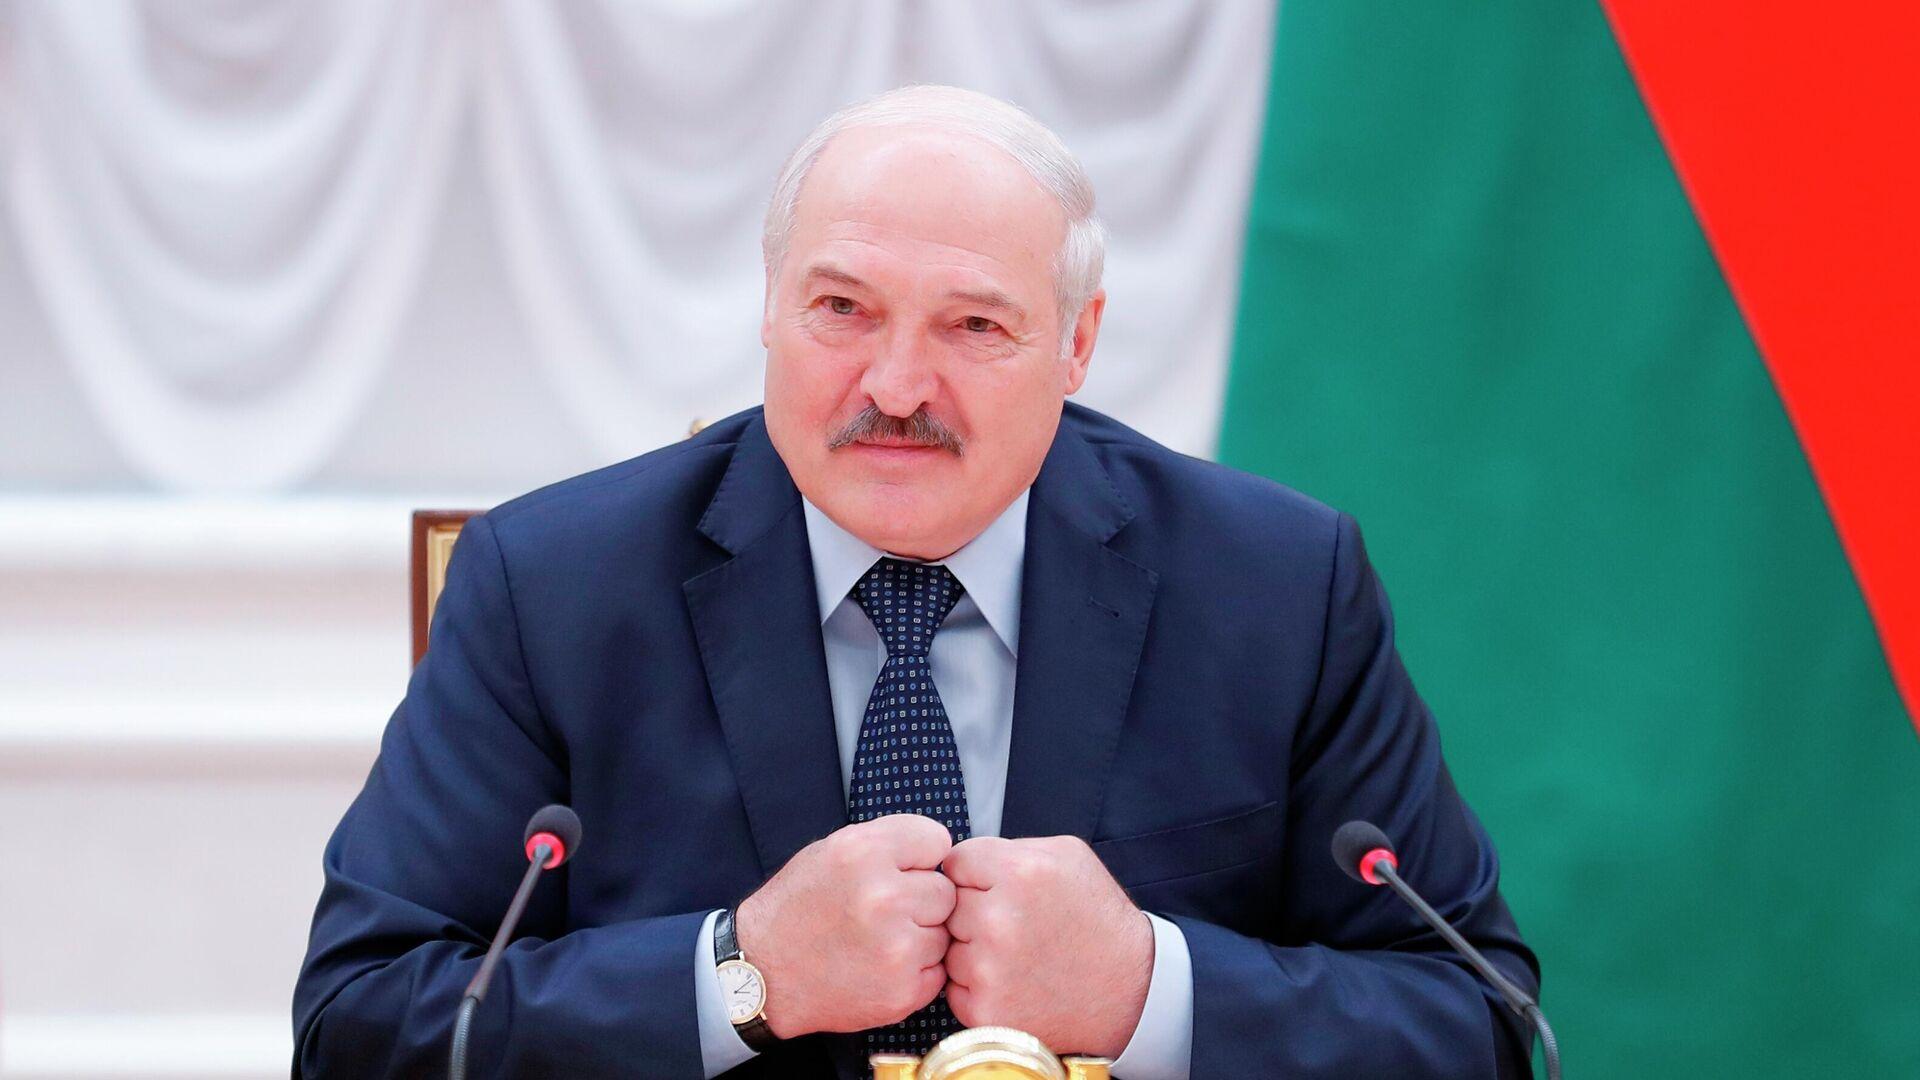 Президент Беларуси Александр Лукашенко - Sputnik Таджикистан, 1920, 29.05.2021